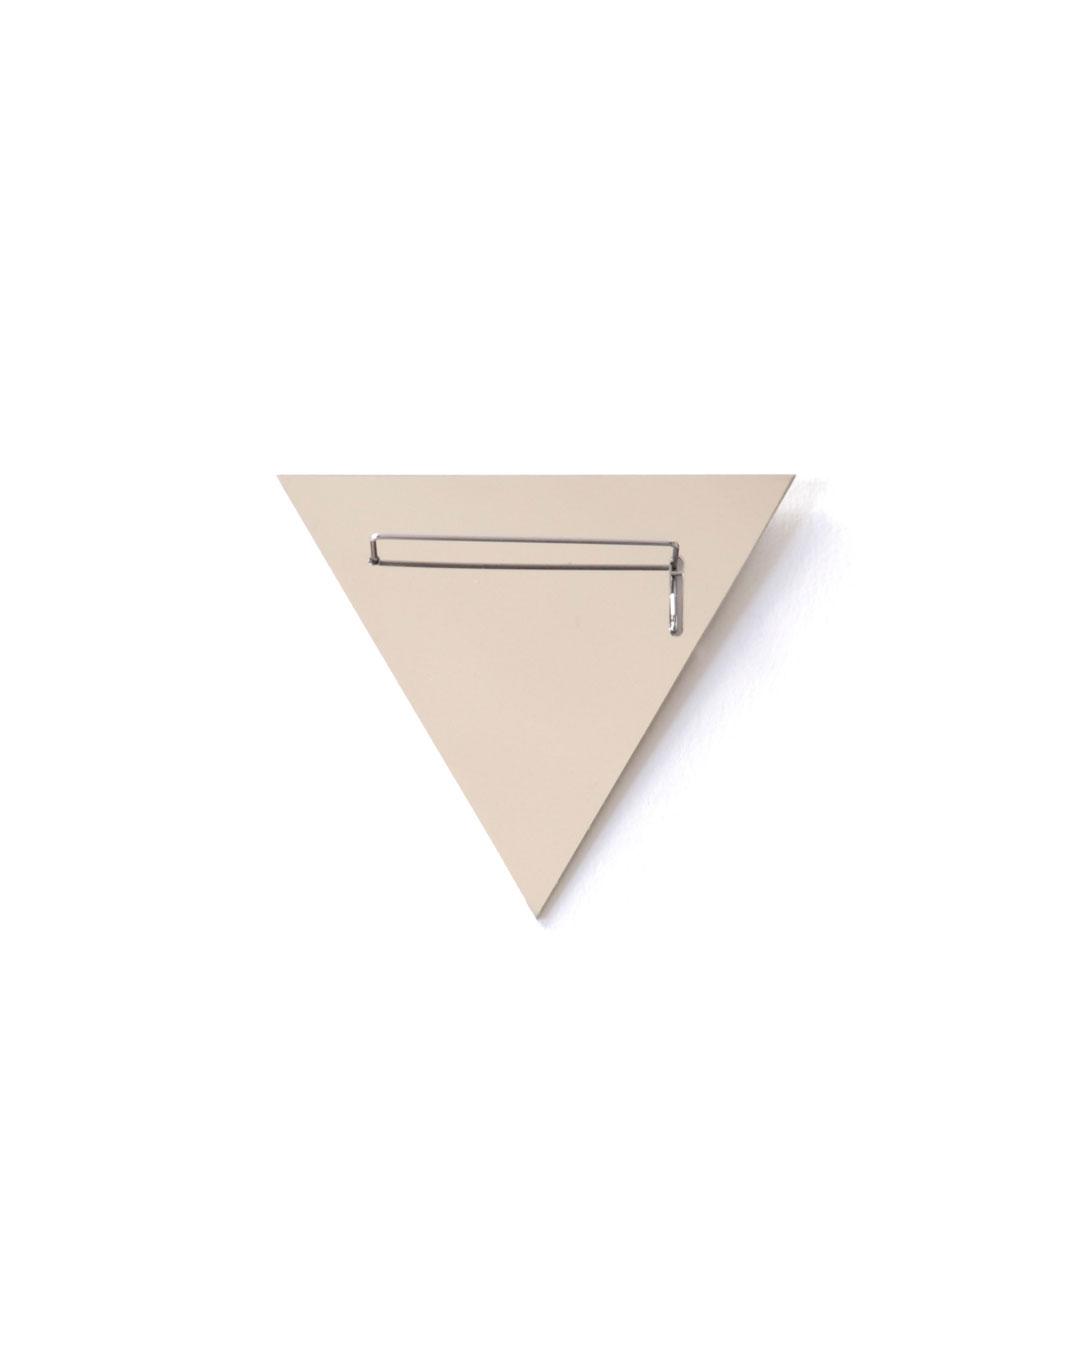 Junwon Jung, Pin and Mirror, 2015, brooch, steel, 60 x 60 mm, €490